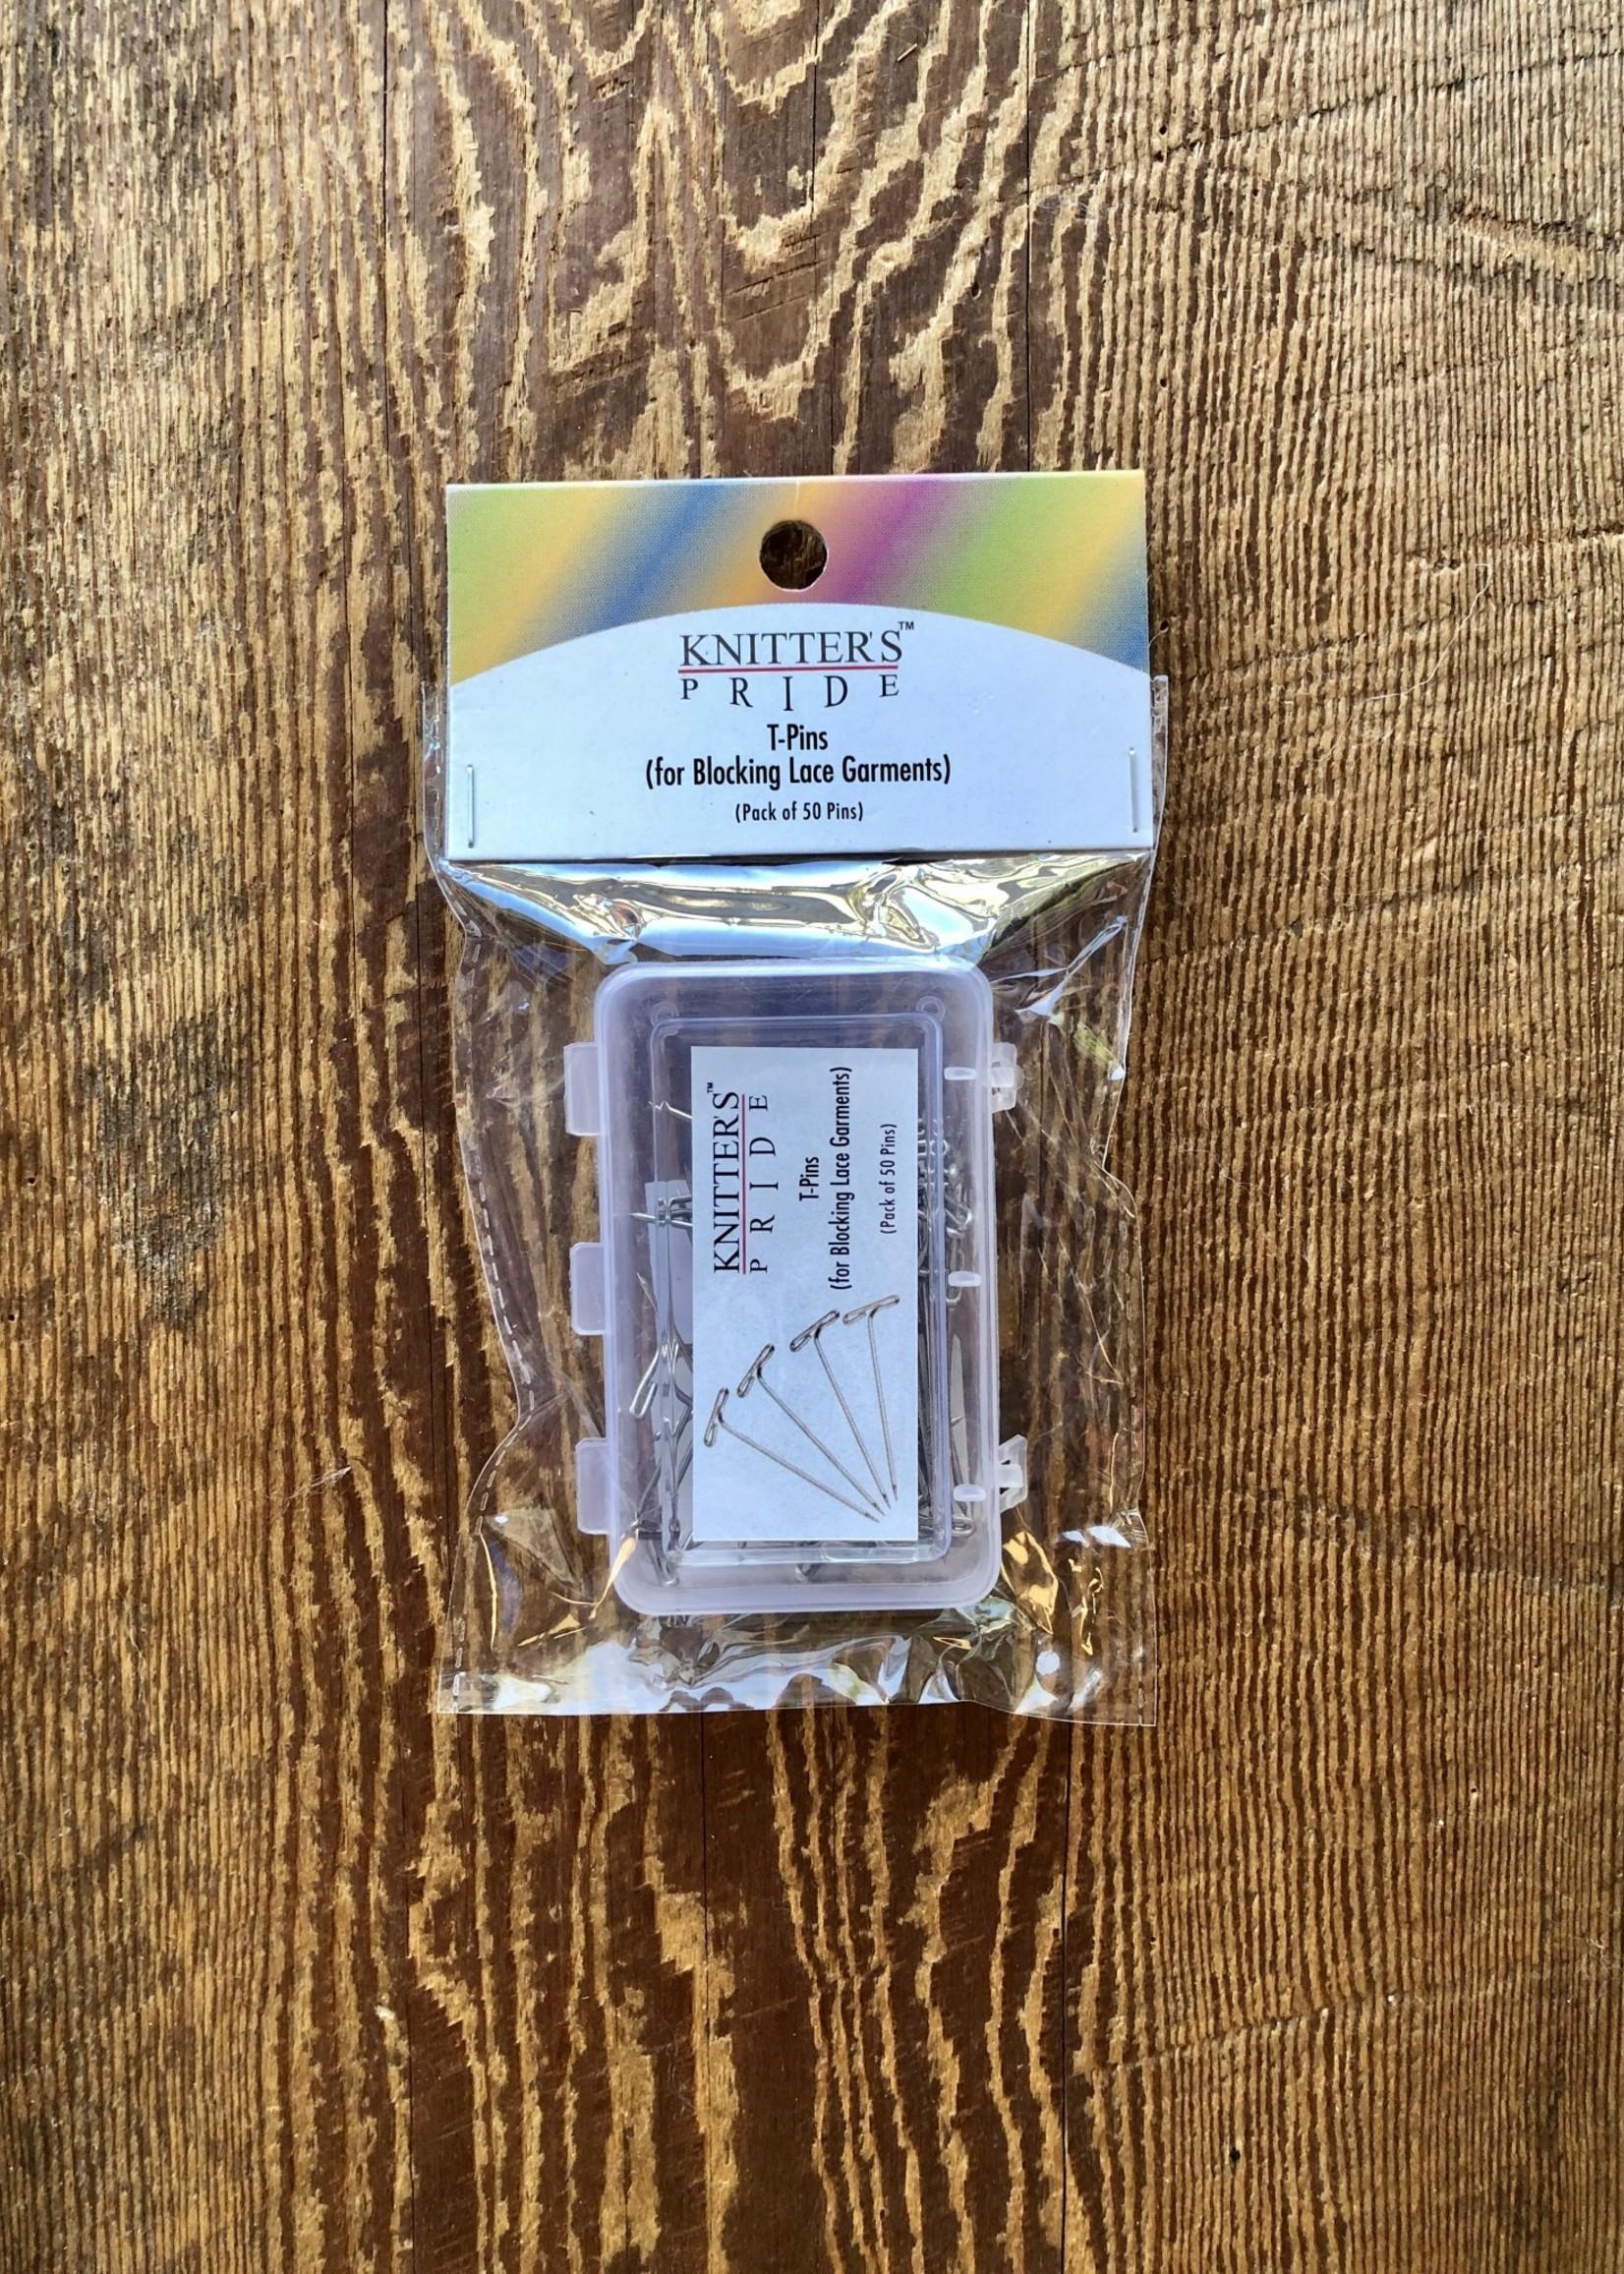 Knitter's Pride KP-Blocking T-Pins 50